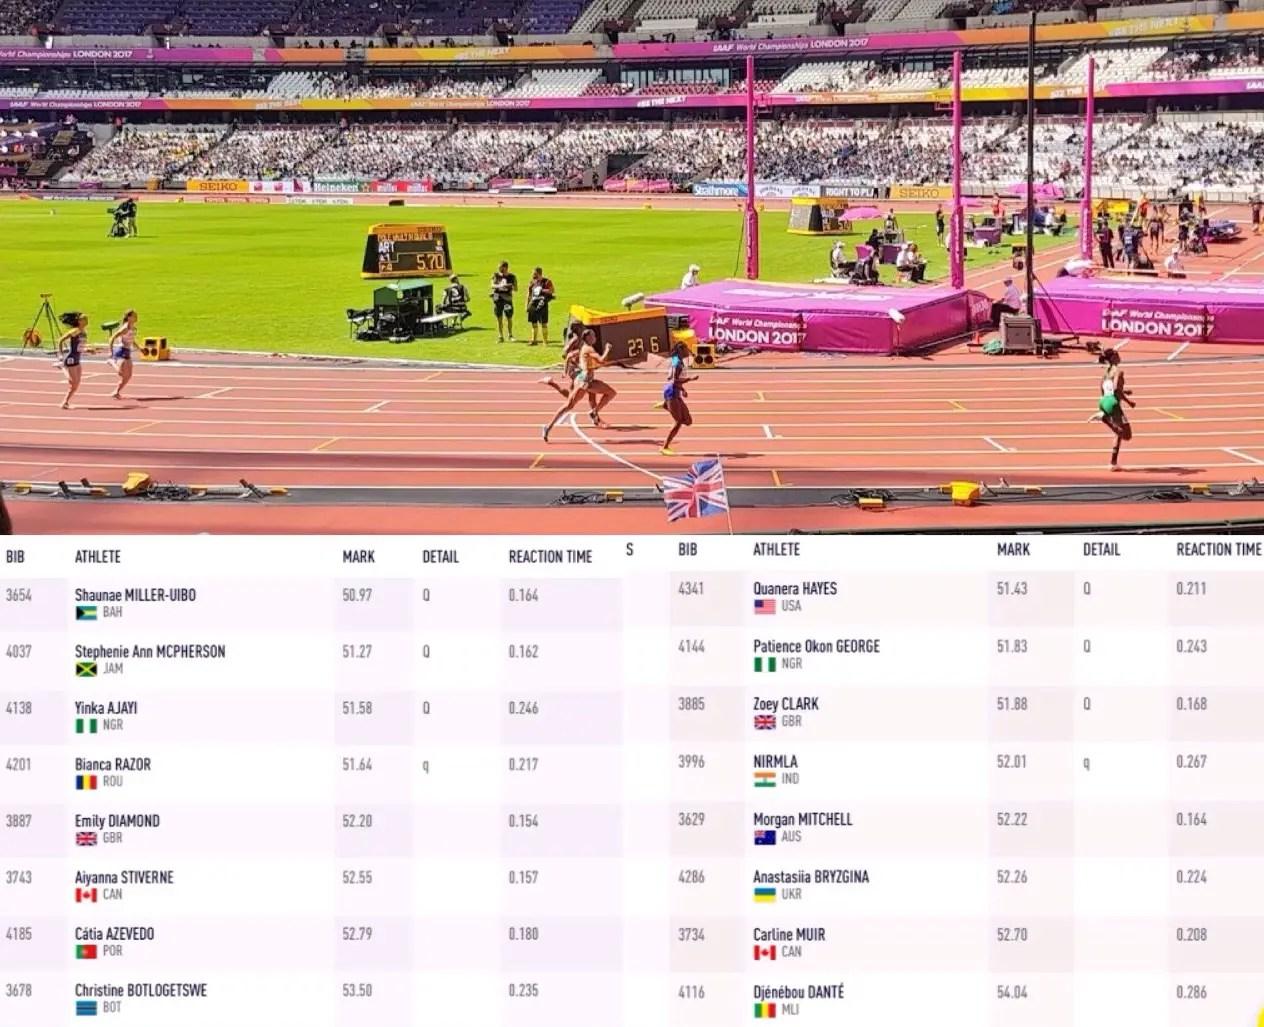 IAAF World's: Nigeria's Ajayi, Okon-George, Bamgbose Qualify For Women's 400m Semis